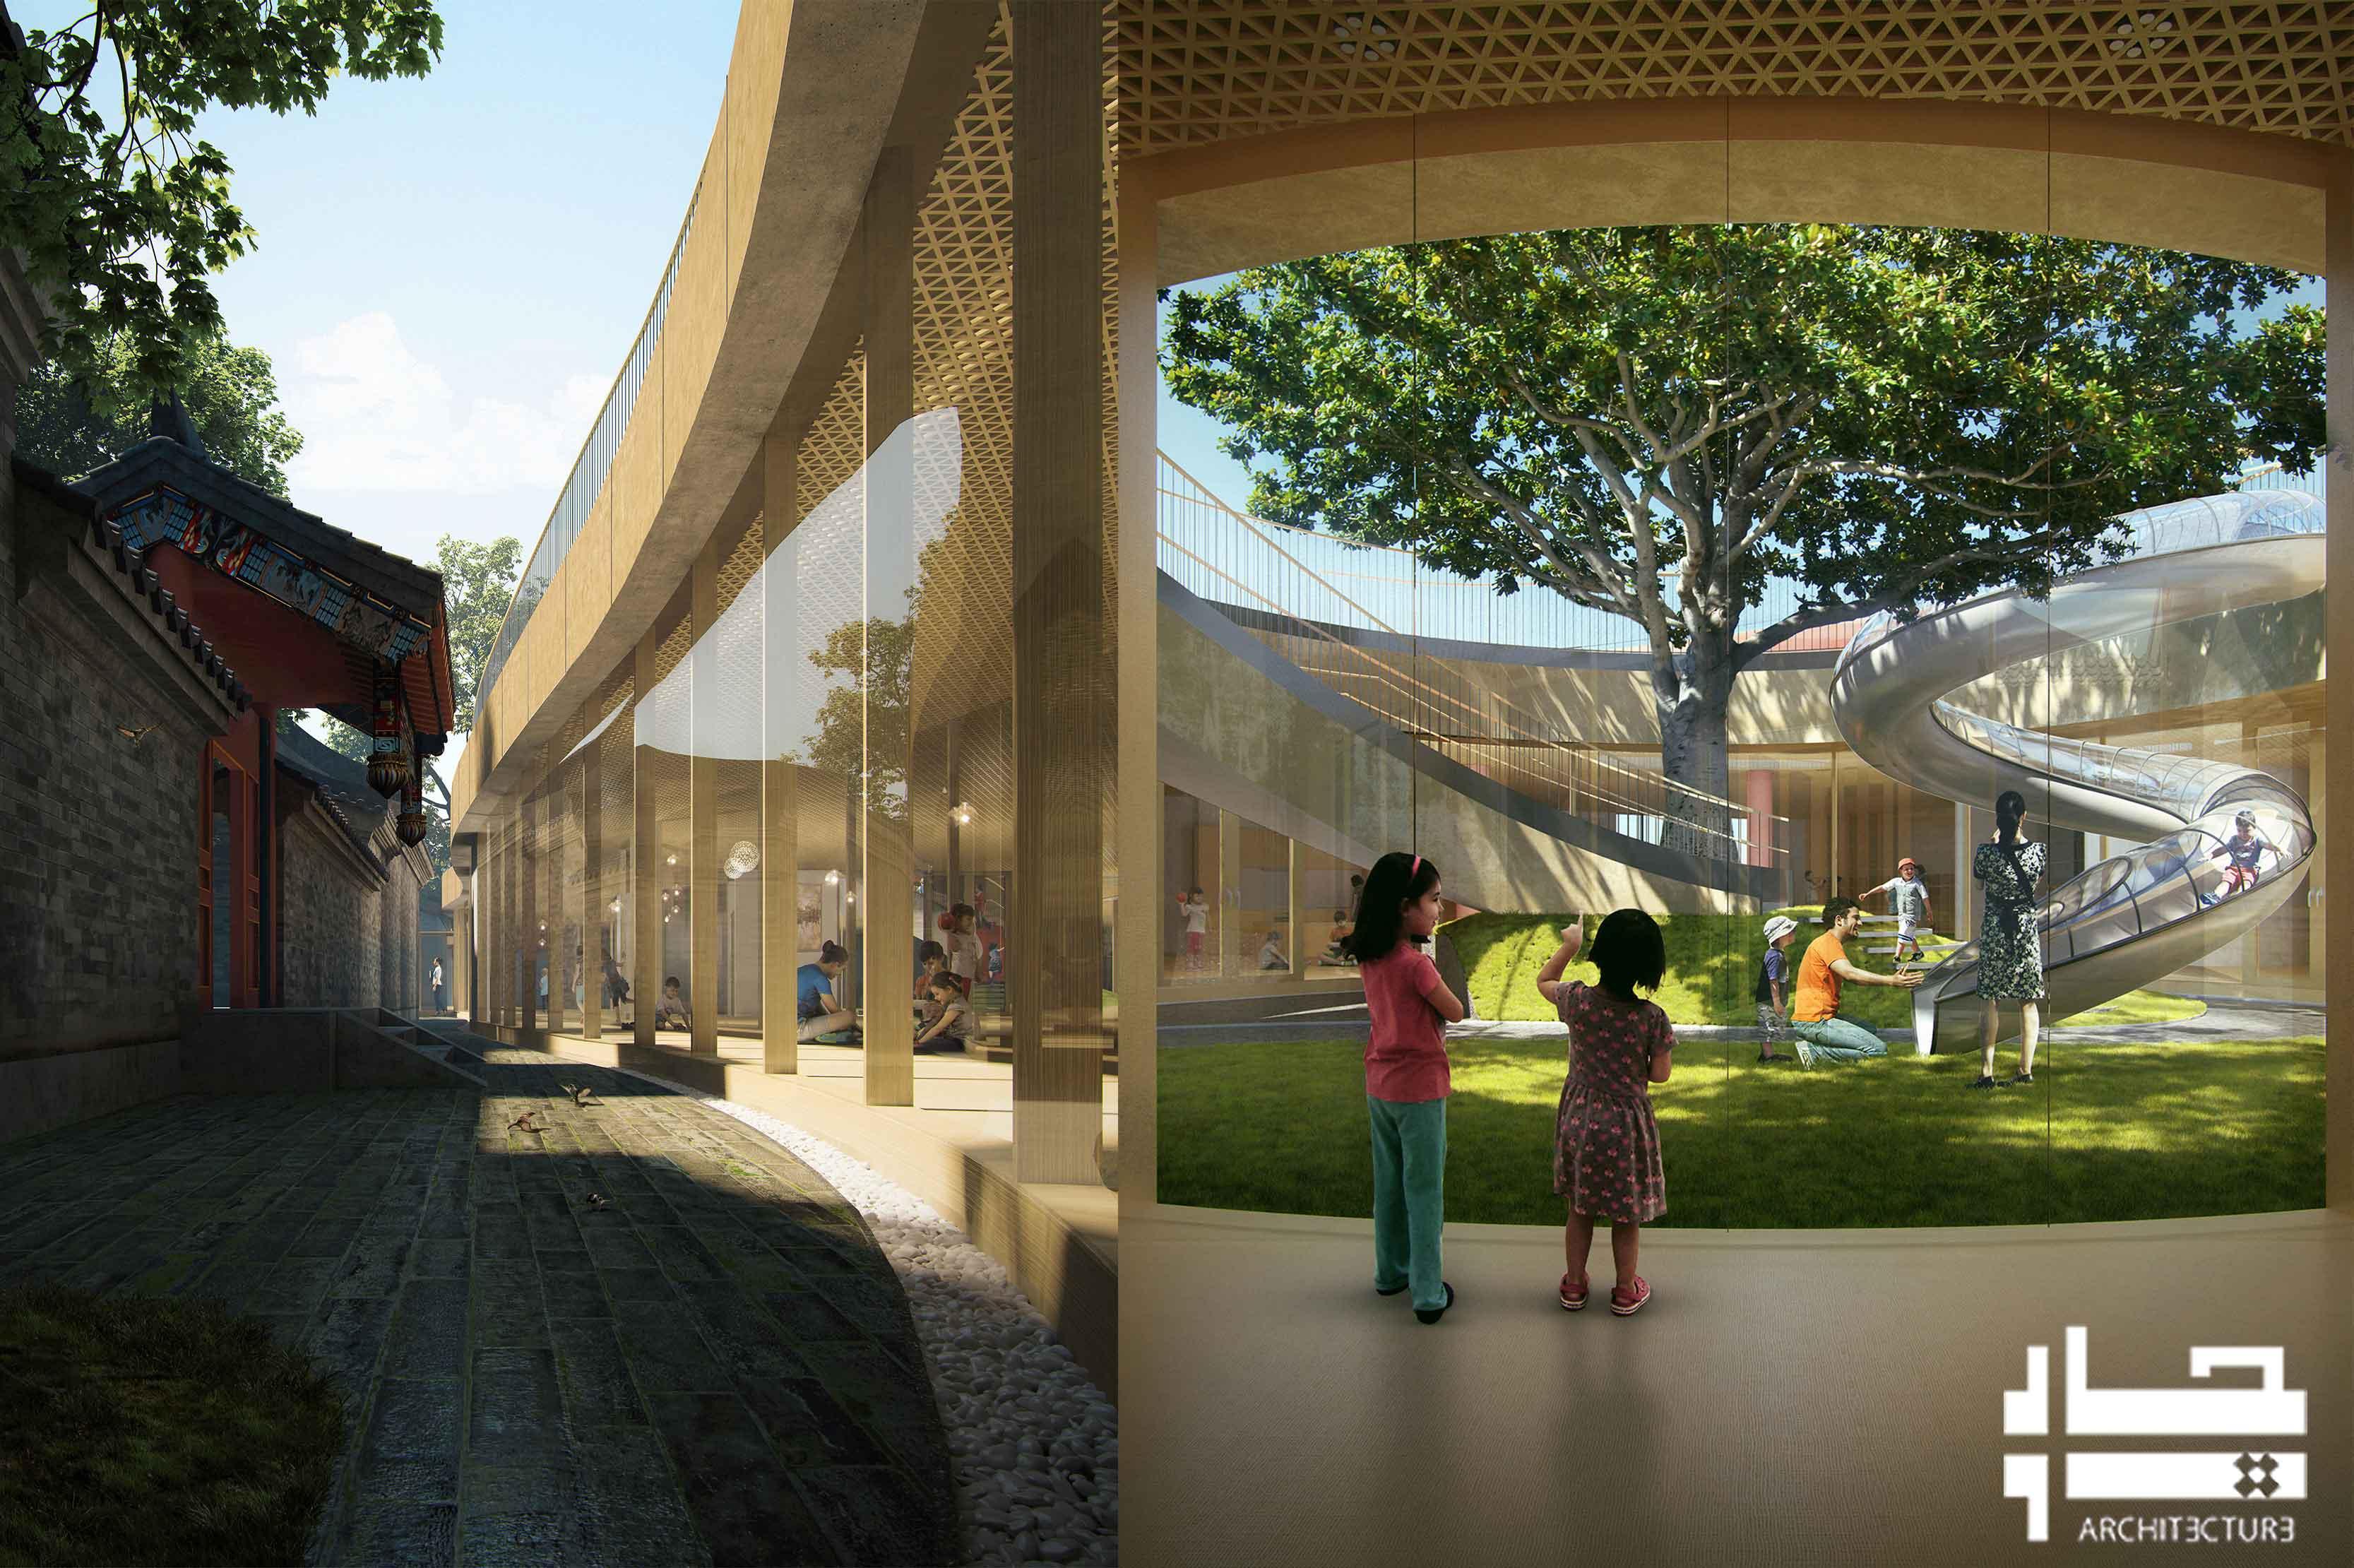 طراحی مهد کودک سیه یوان